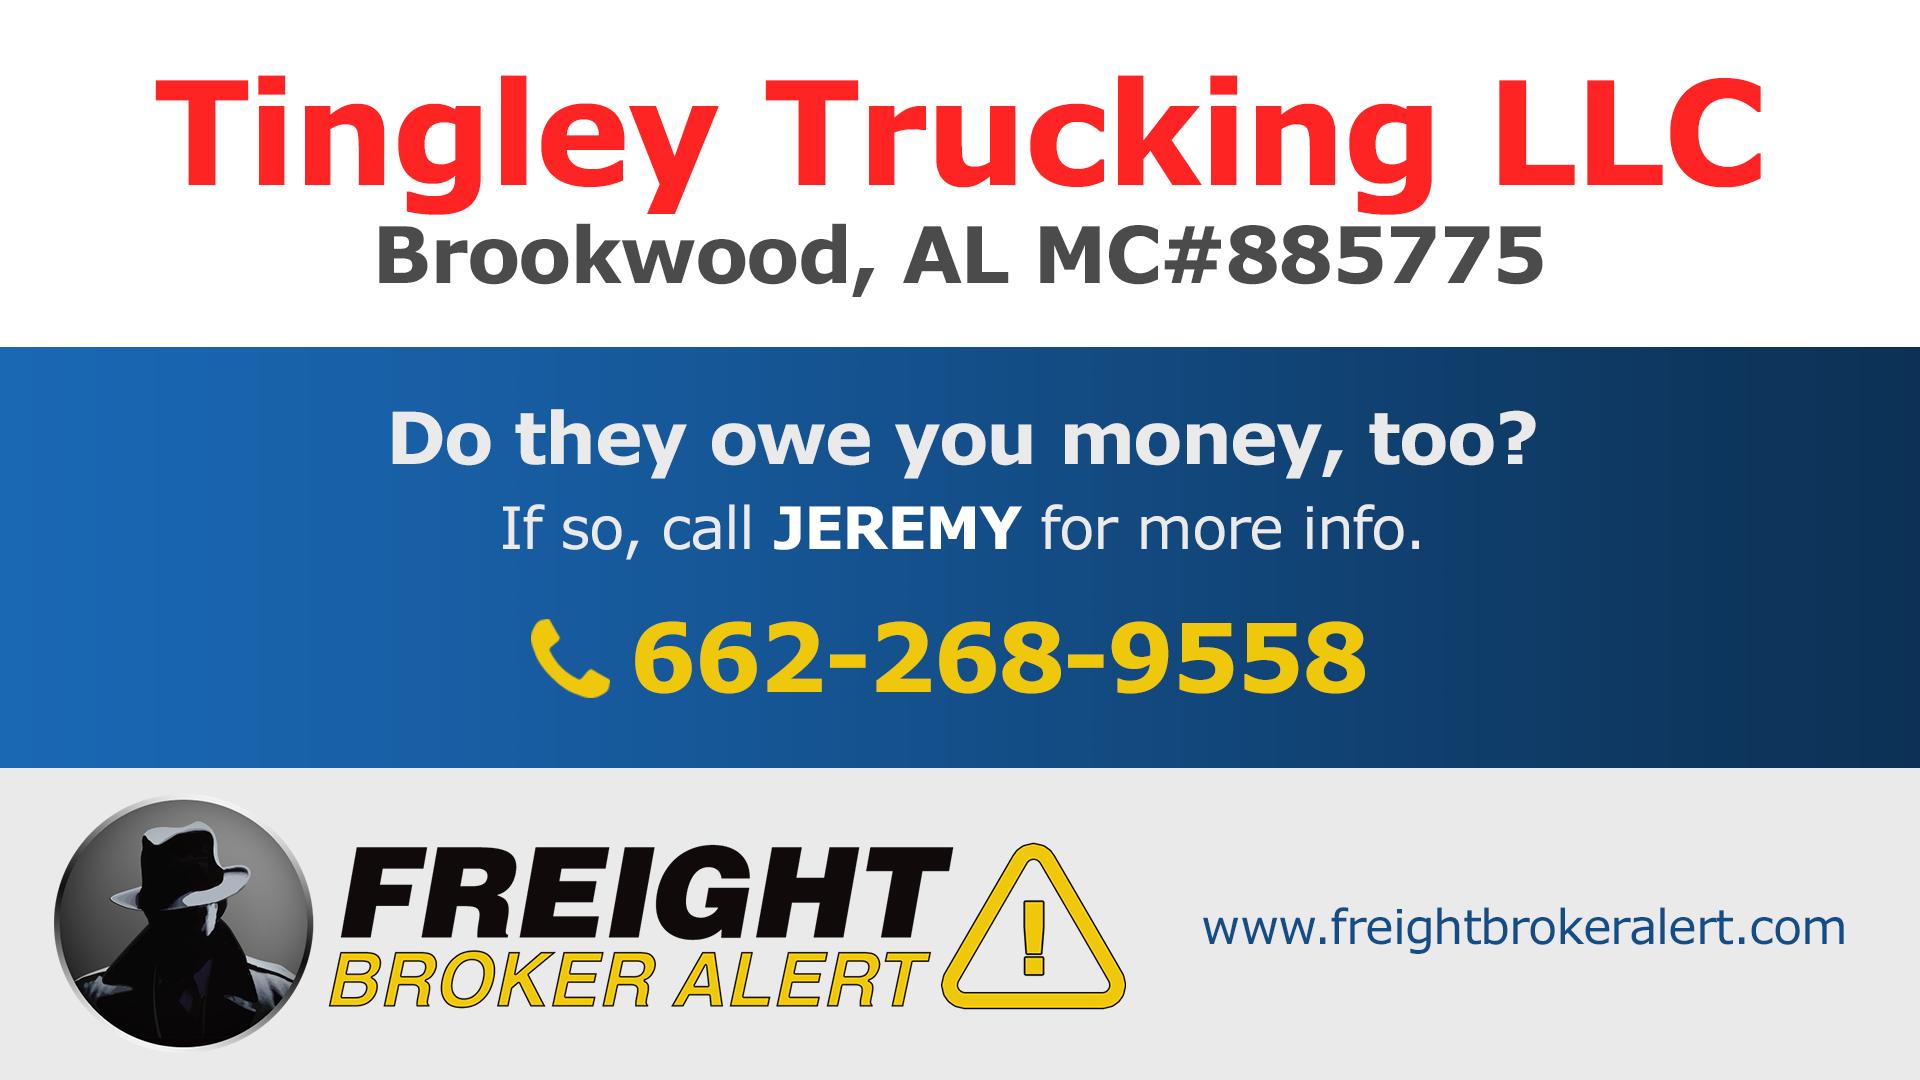 Tingley Trucking LLC Alabama